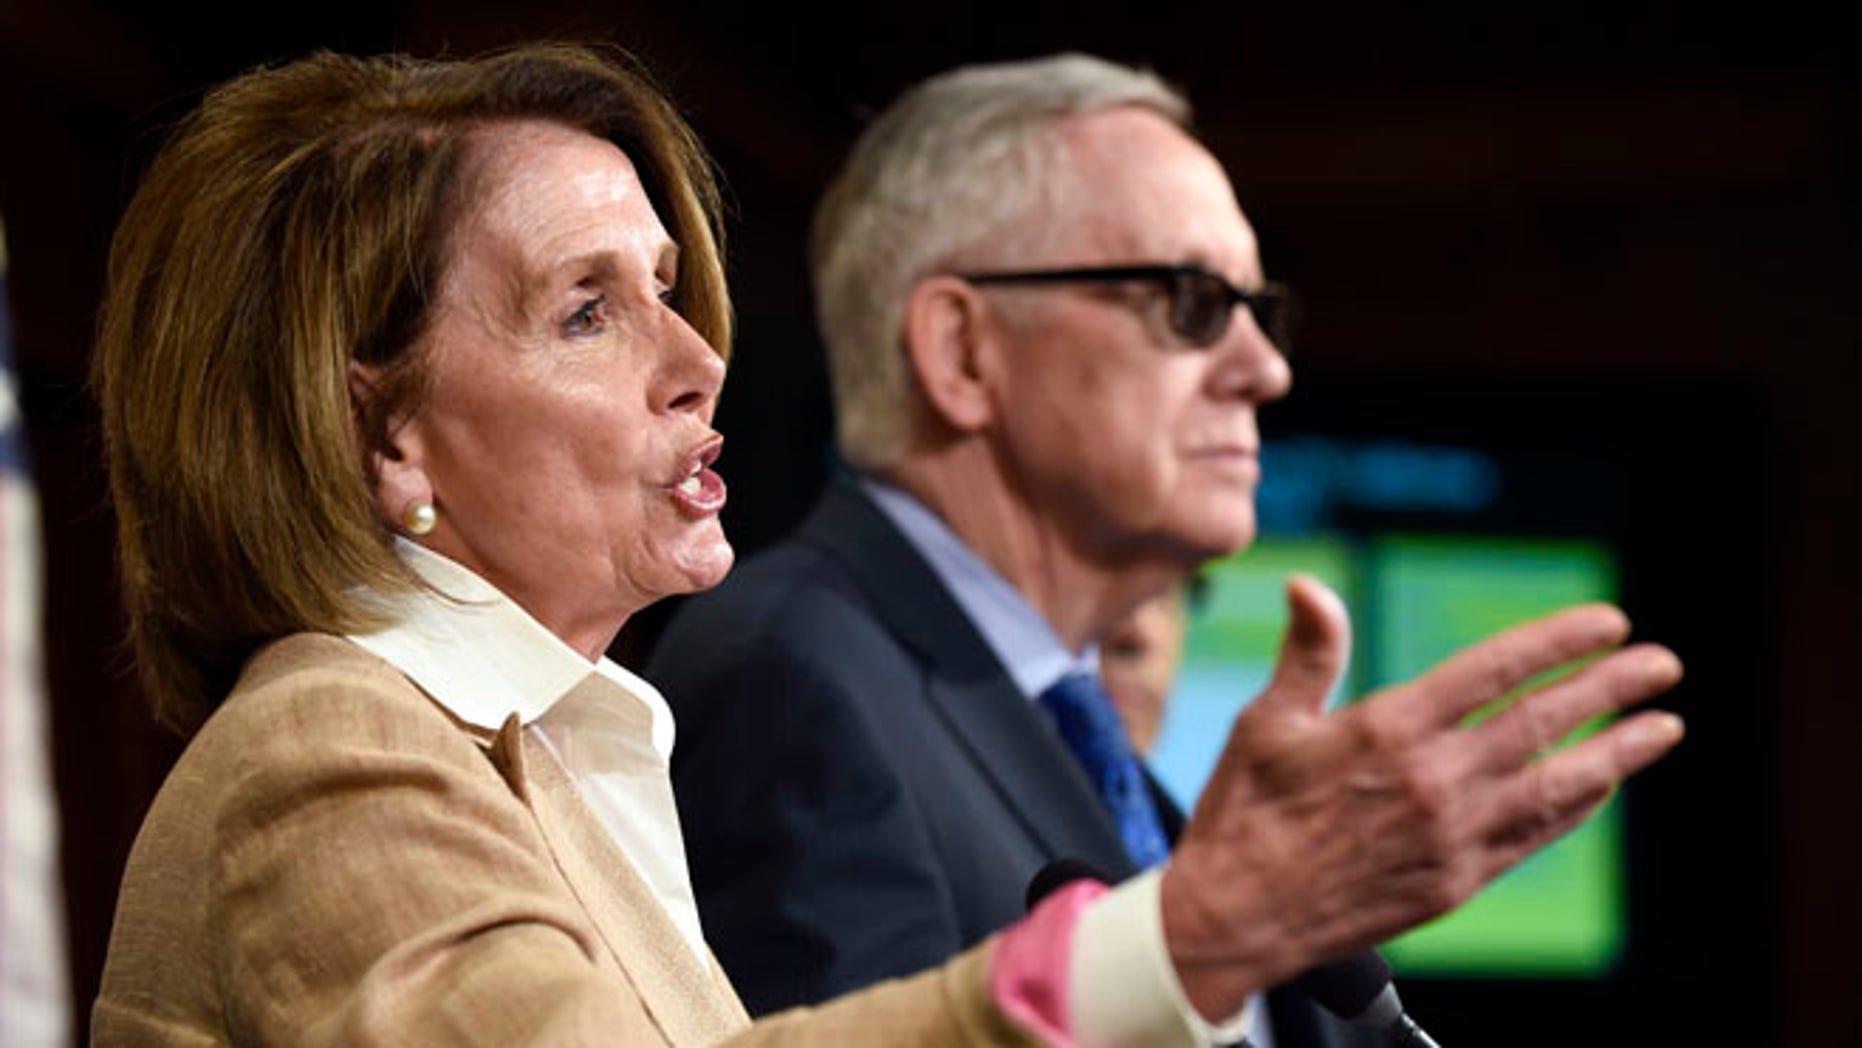 FILE: June 25, 2015: House Minority Leader Nancy Pelosi of Calif., and Senate Minority Leader Harry Reid, of Nev., on Capitol Hill, Wash., D.C.